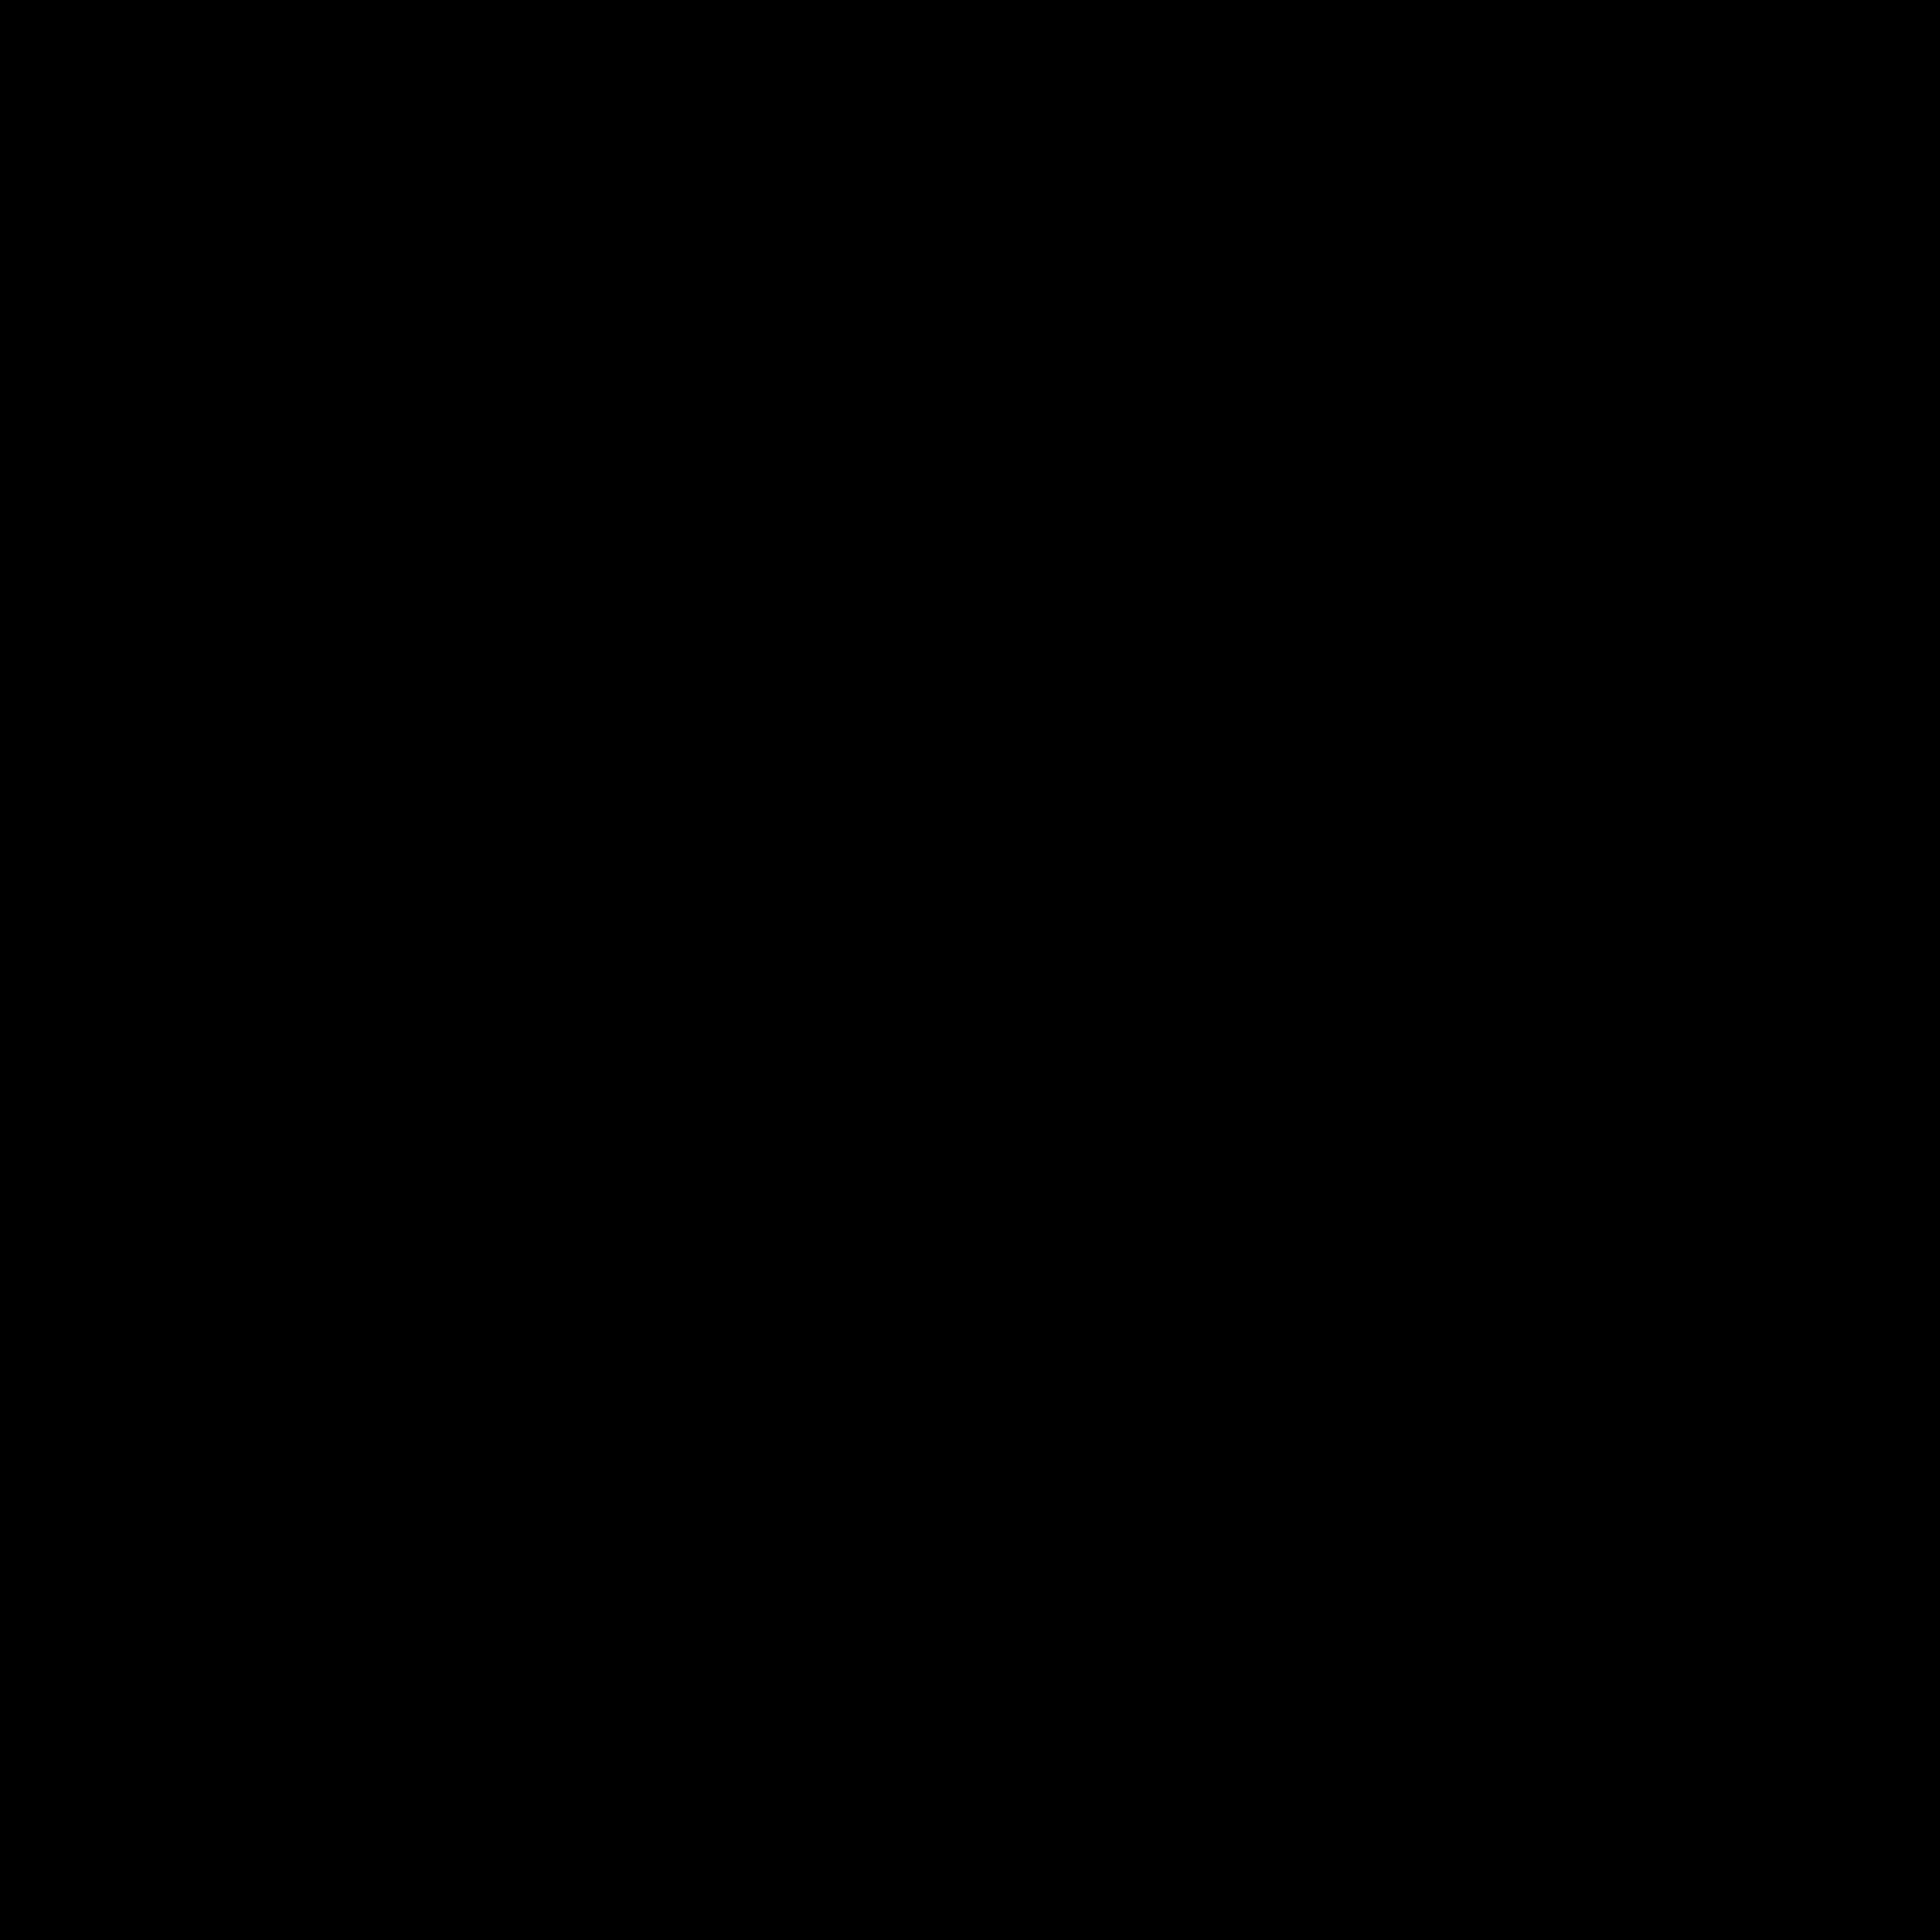 Downward facing arrow